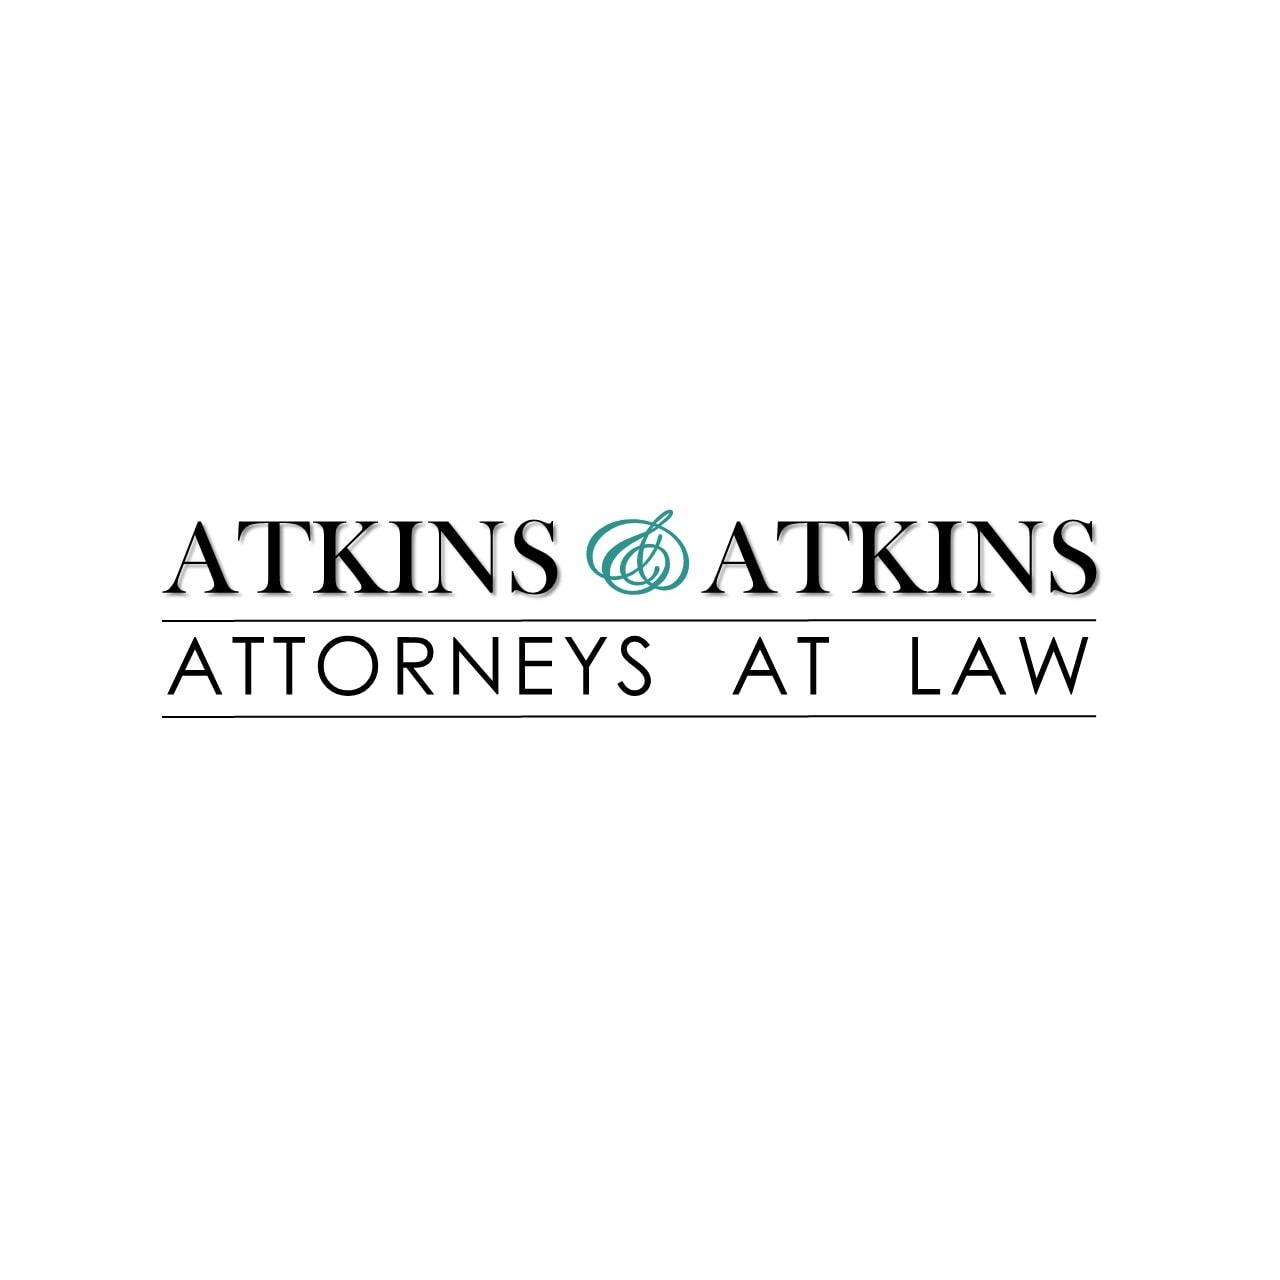 Atkins & Atkins Attorneys At law Logo